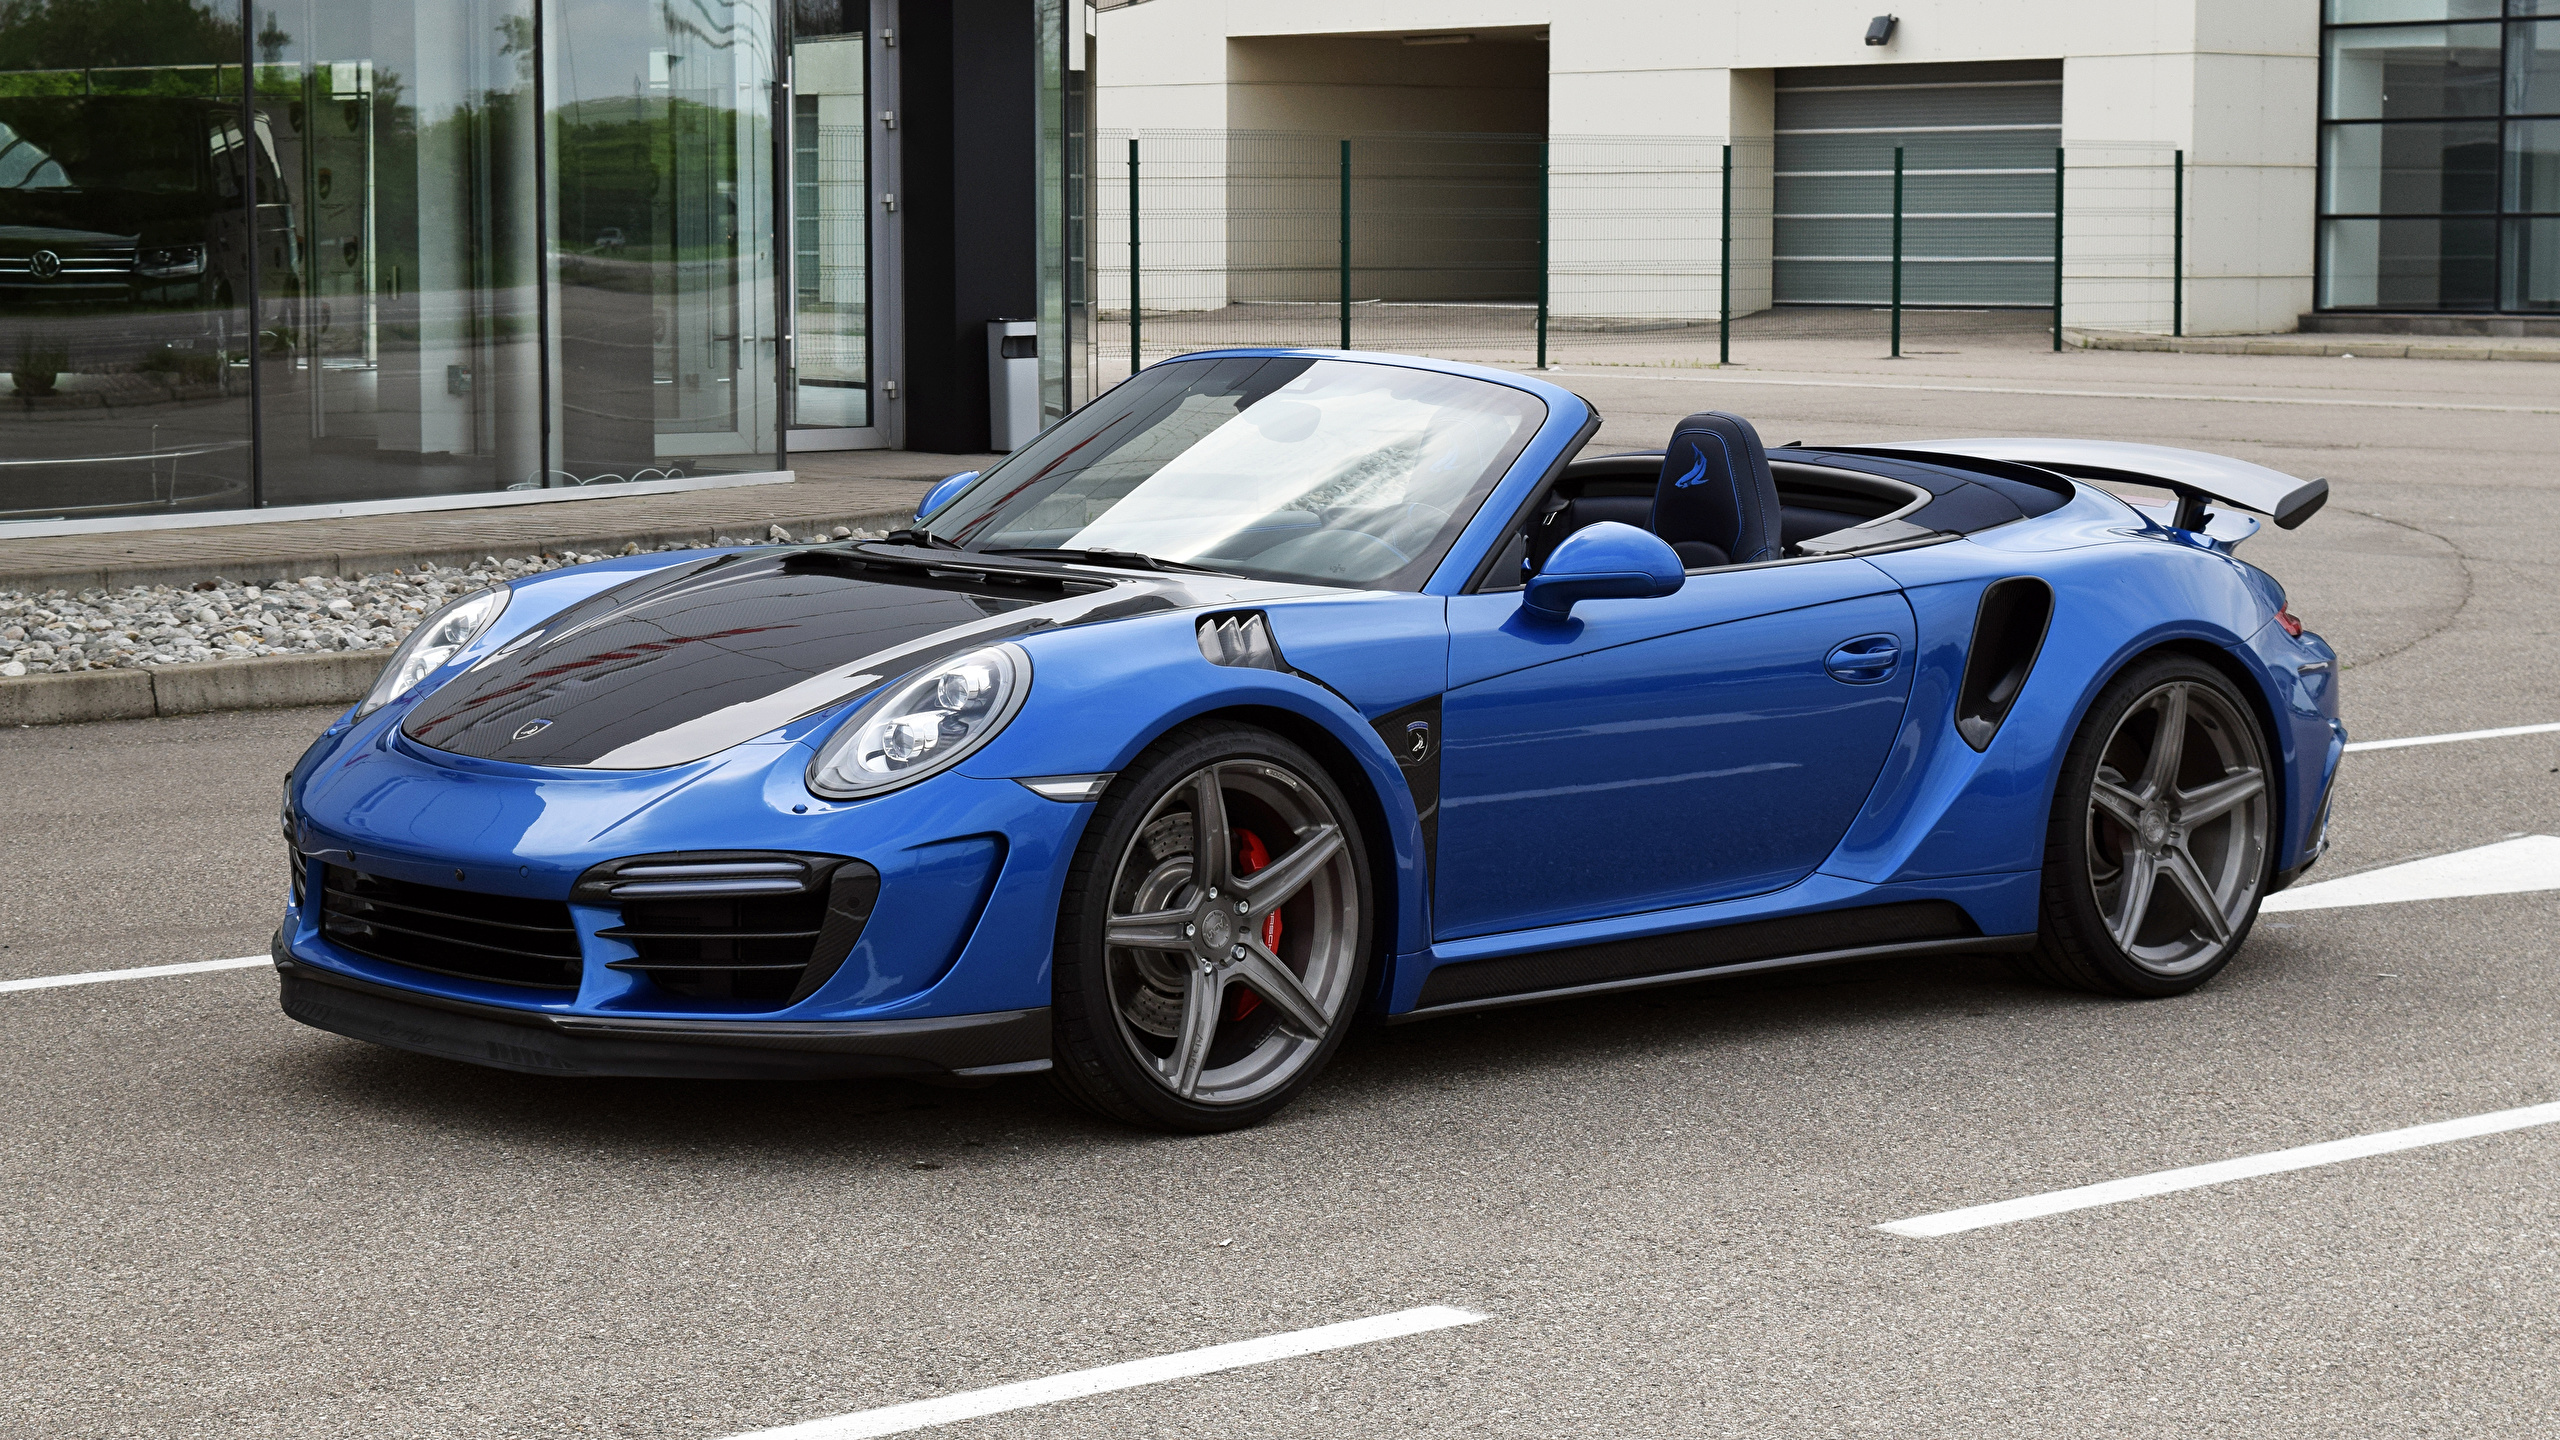 Fonds d'ecran 2560x1440 Tuning 2017 TopCar Porsche 911 Turbo Stinger GTR Métallique Cabriolet ...